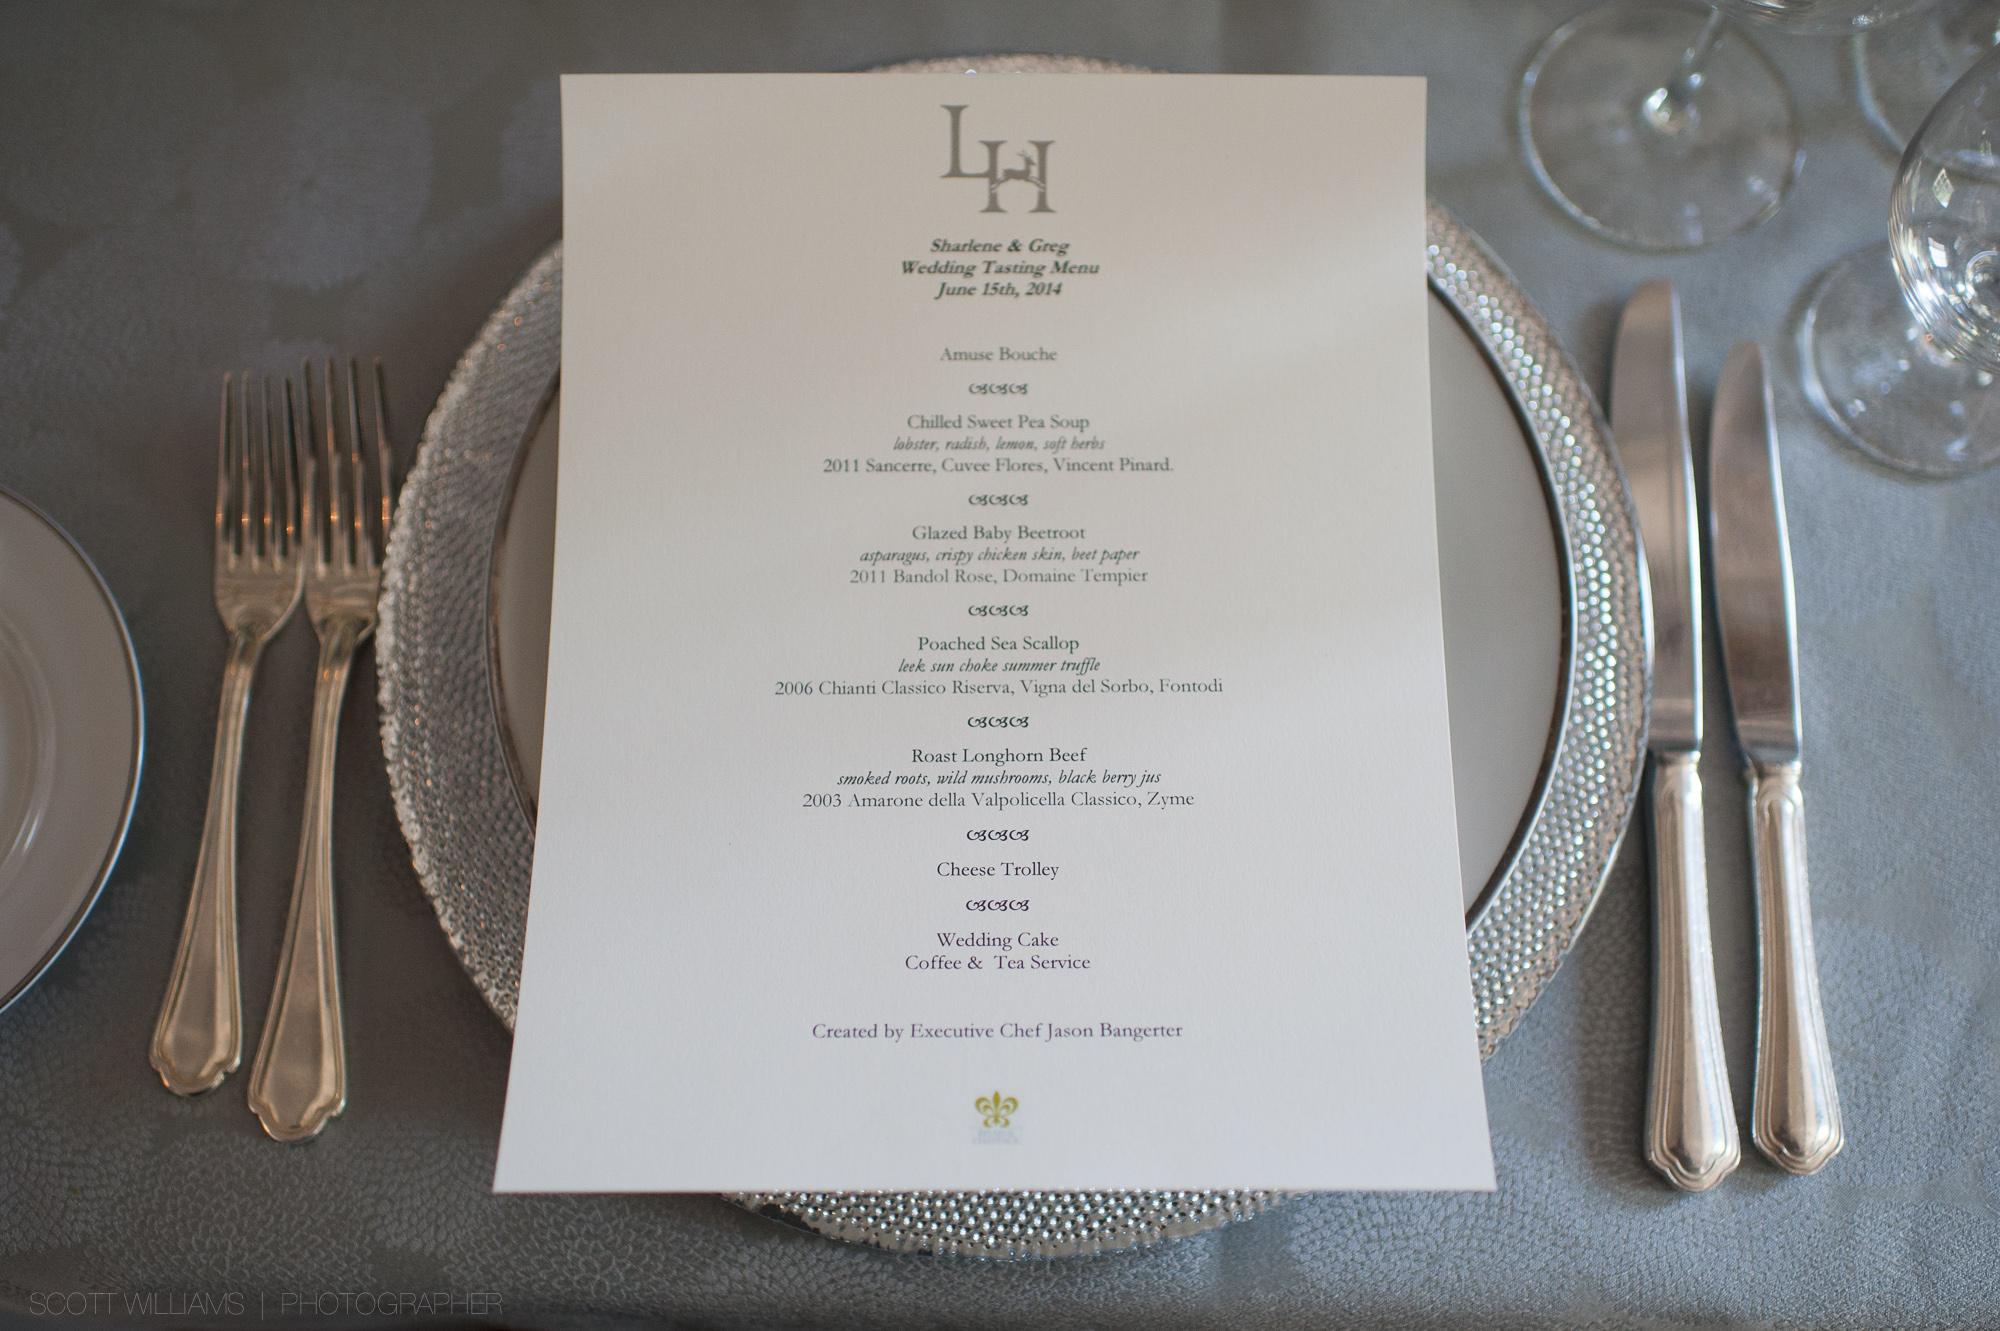 Langdon_hall_wedding-place-setting.jpg